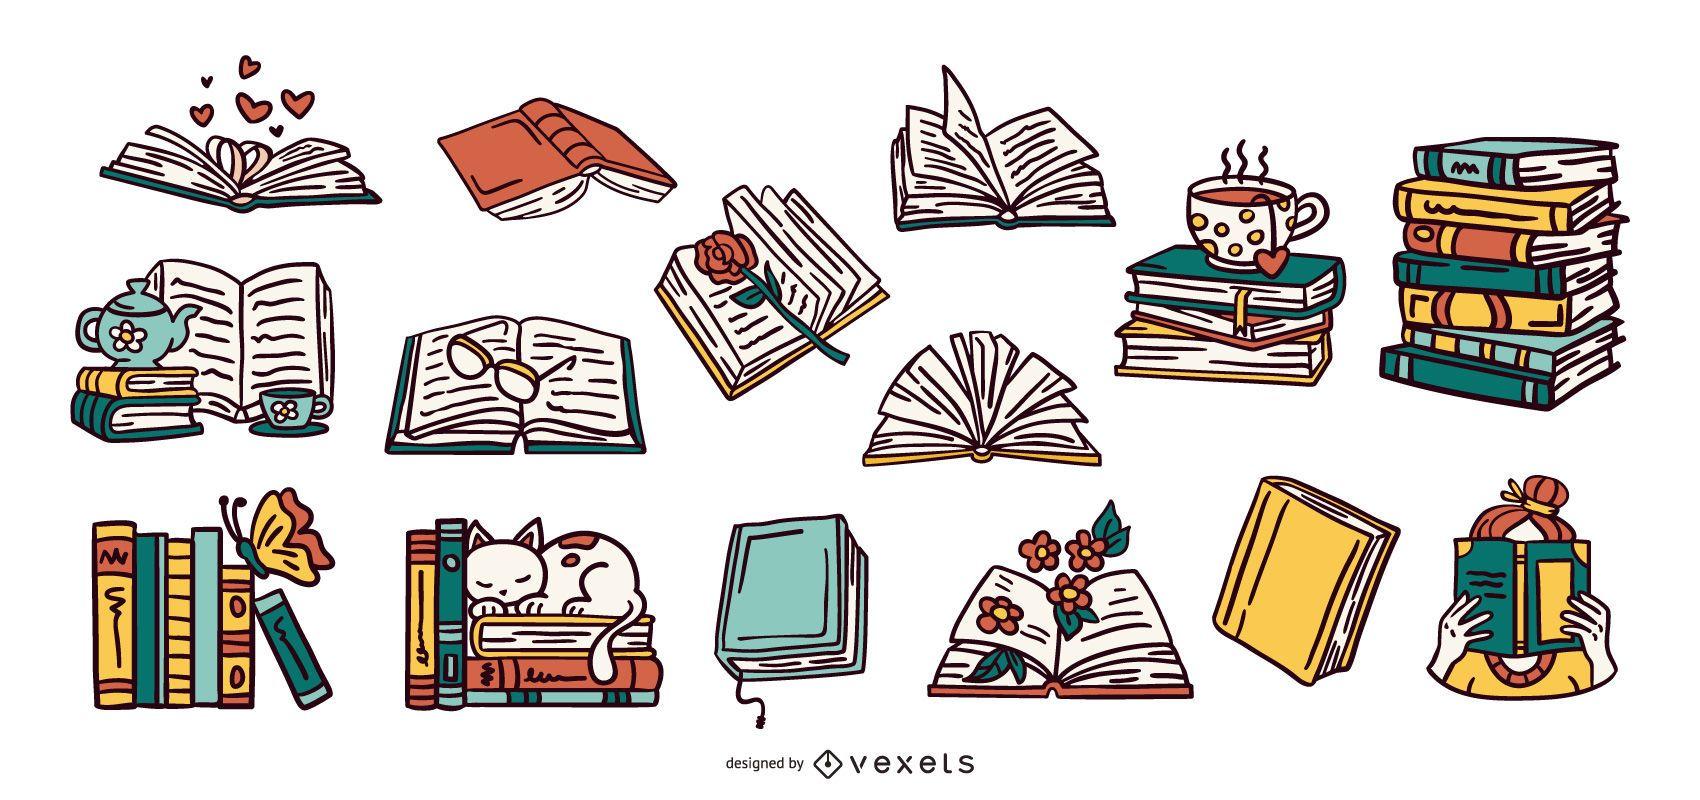 Hand drawn books illustration collection